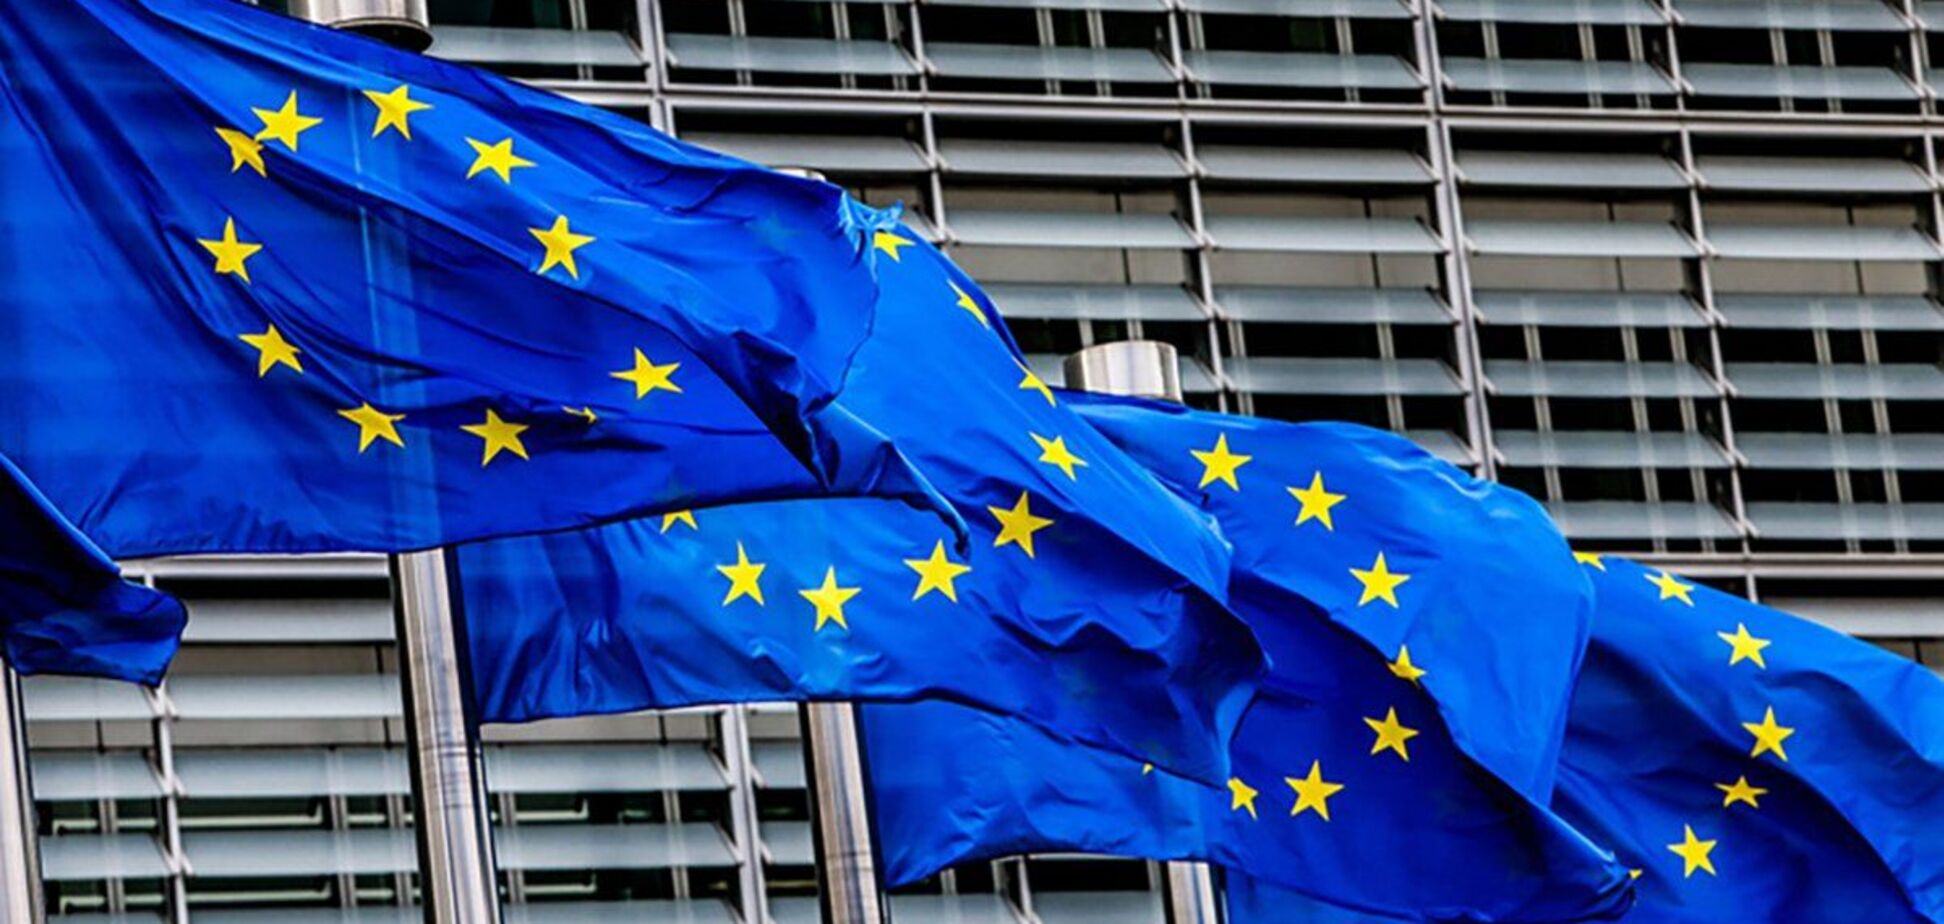 Позачерговий саміт ЄС перенесли